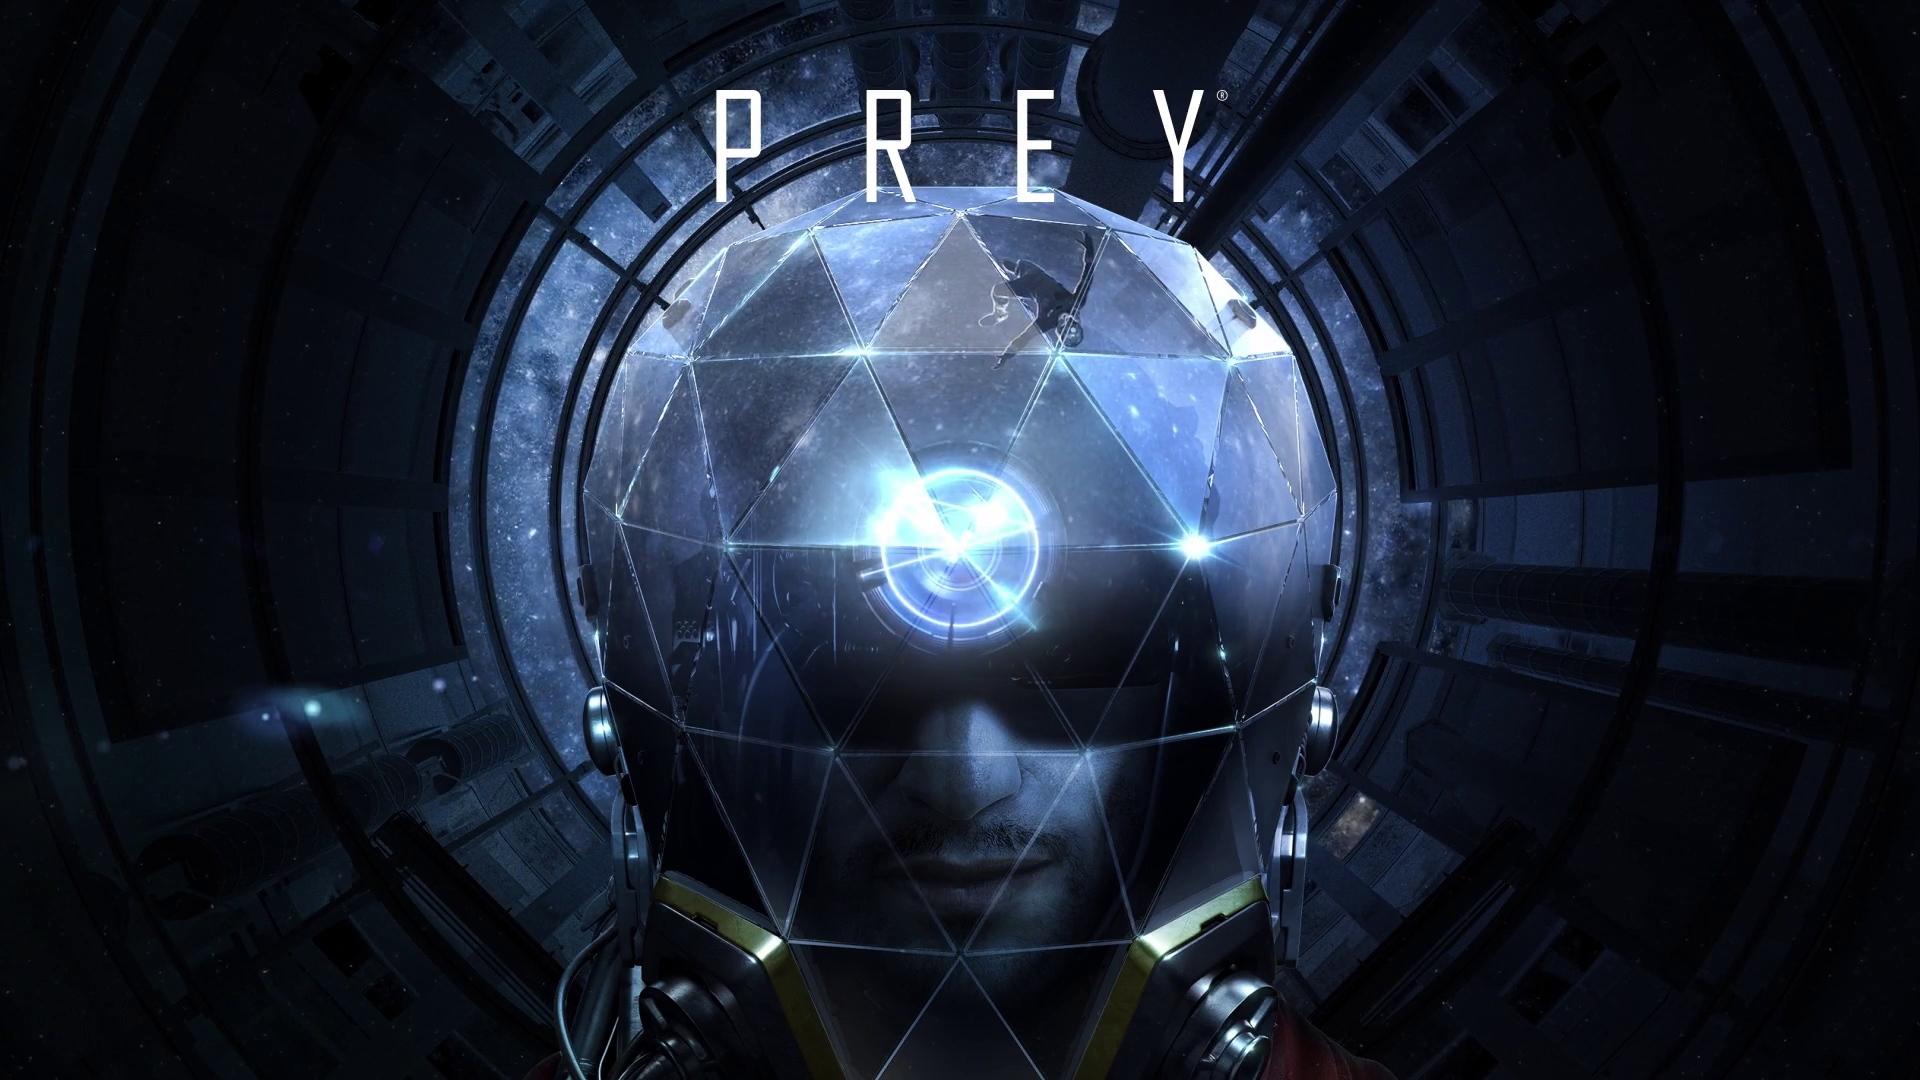 Wallpaper : Prey 2017, geometry, video games 1920x1080 ... Video Games 2017 Wallpaper Hd